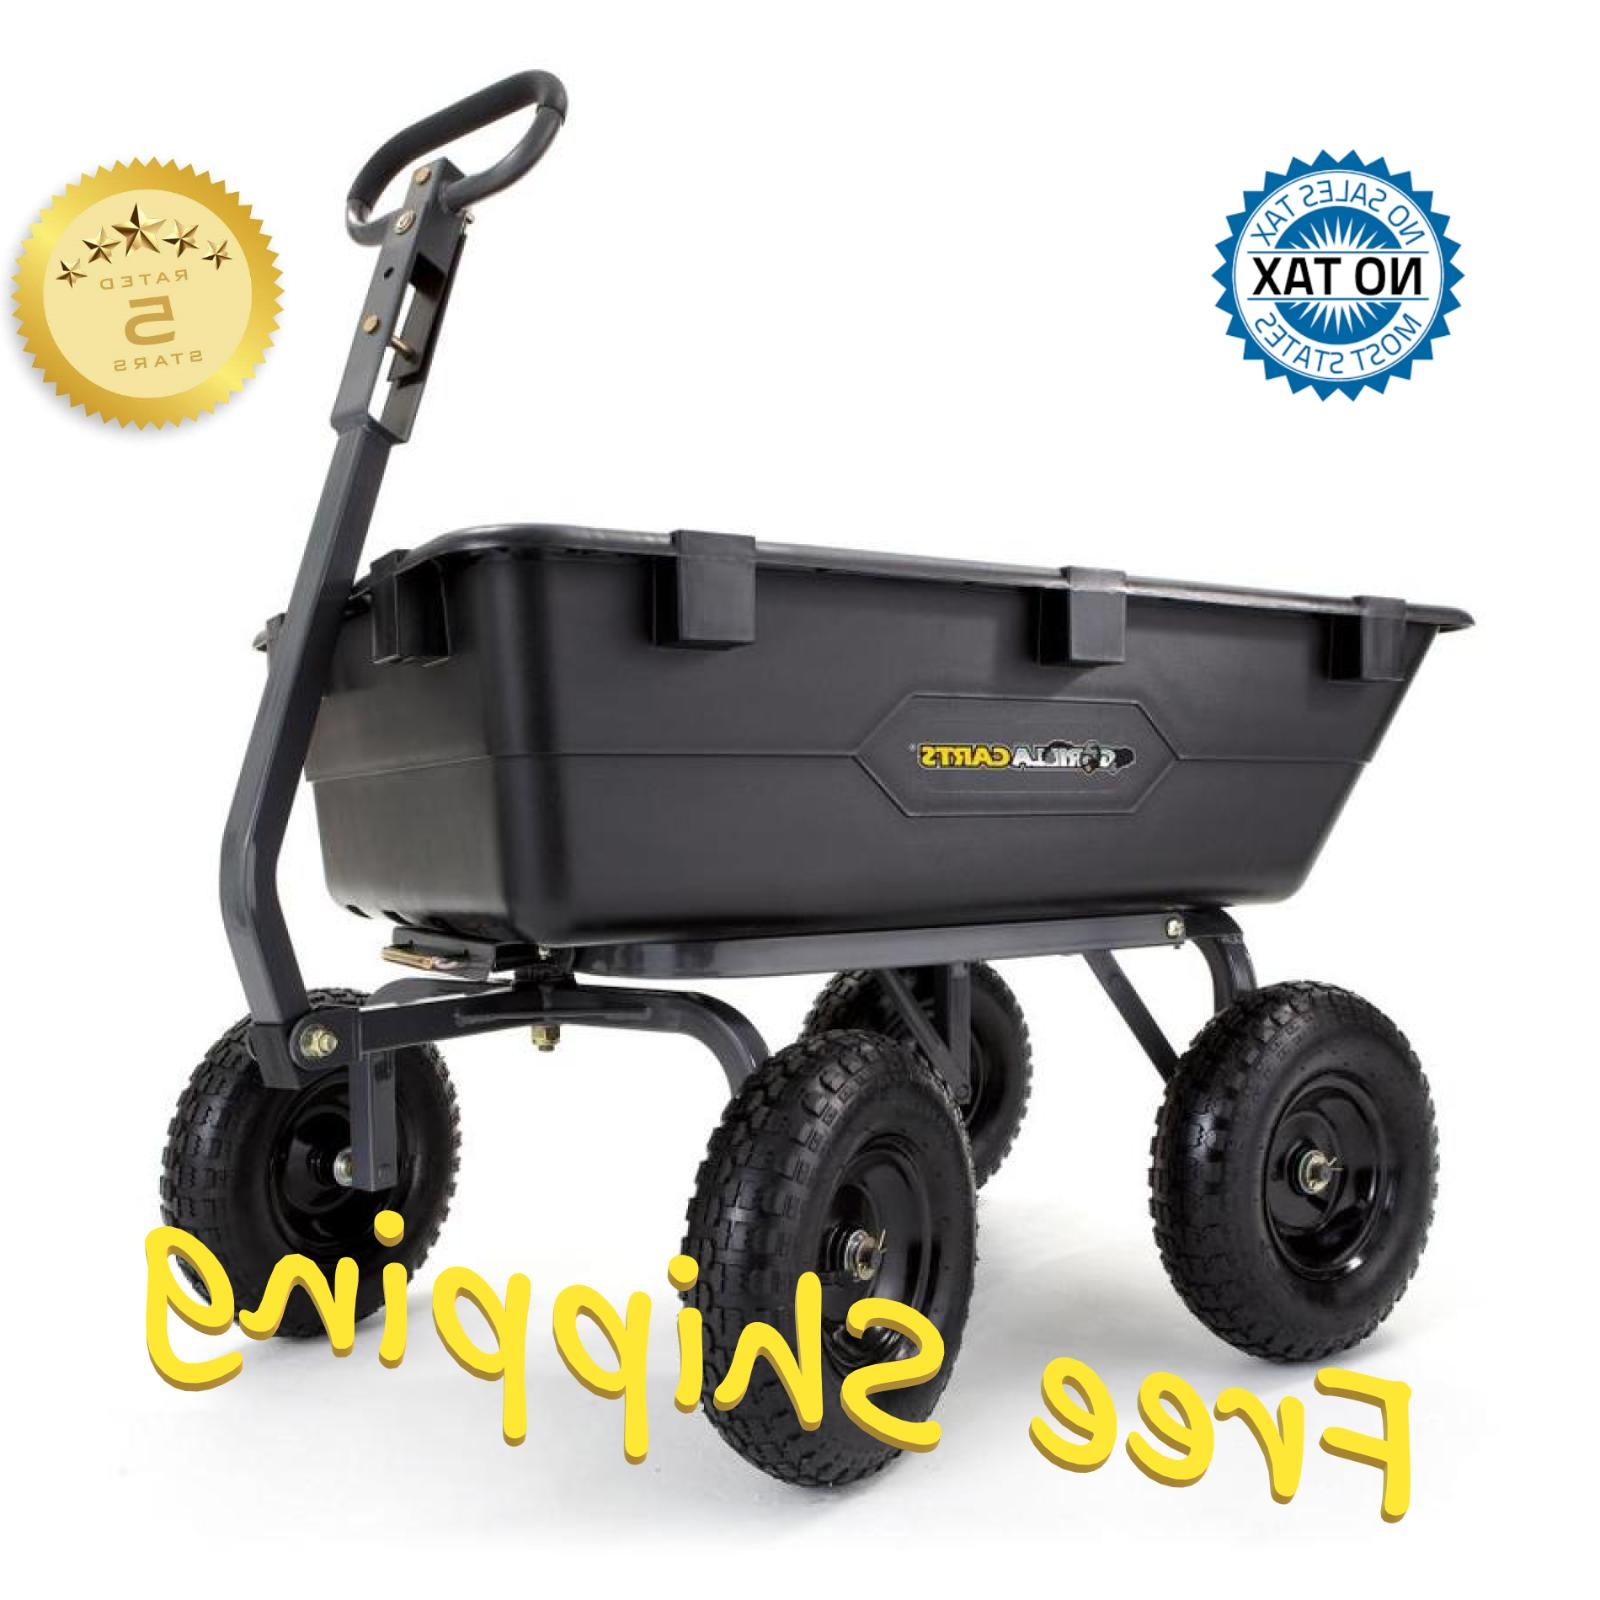 Gorilla Carts Heavy-Duty Garden Poly Dump Cart with 2-in-1 1,200-lb